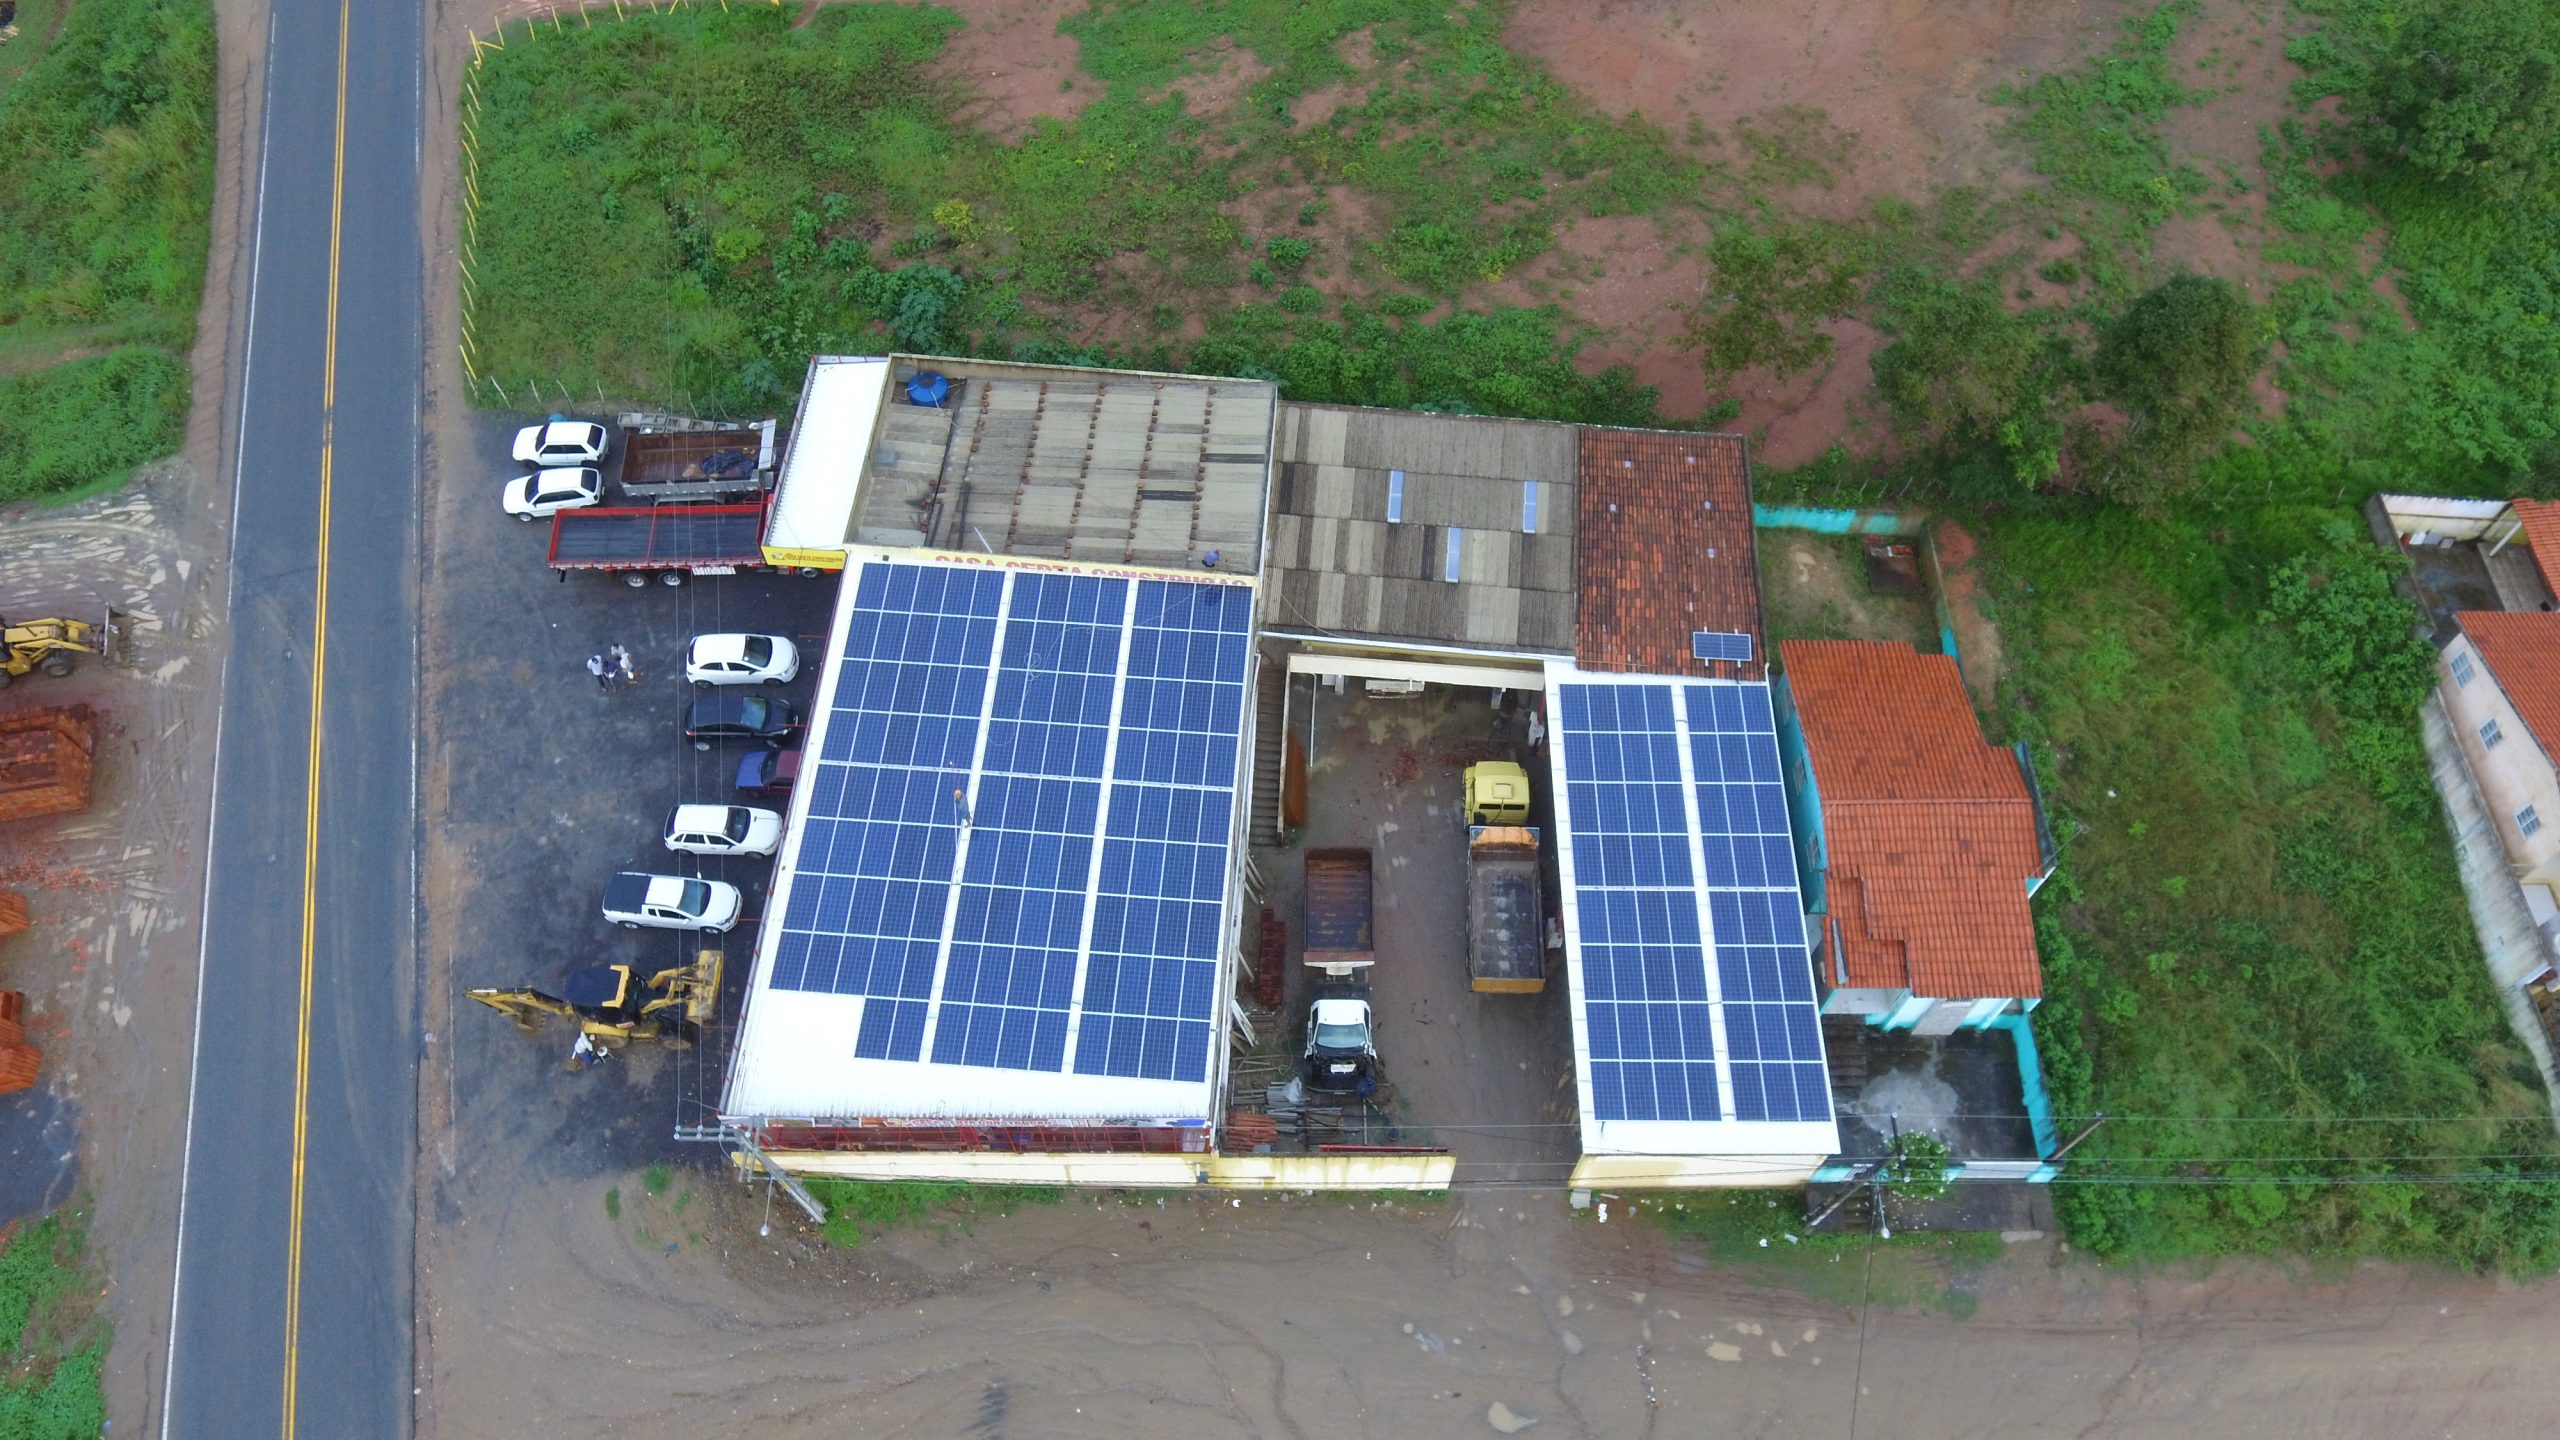 USINA COMERCIAL – LIMOEIRO (PE) – 56 kWp